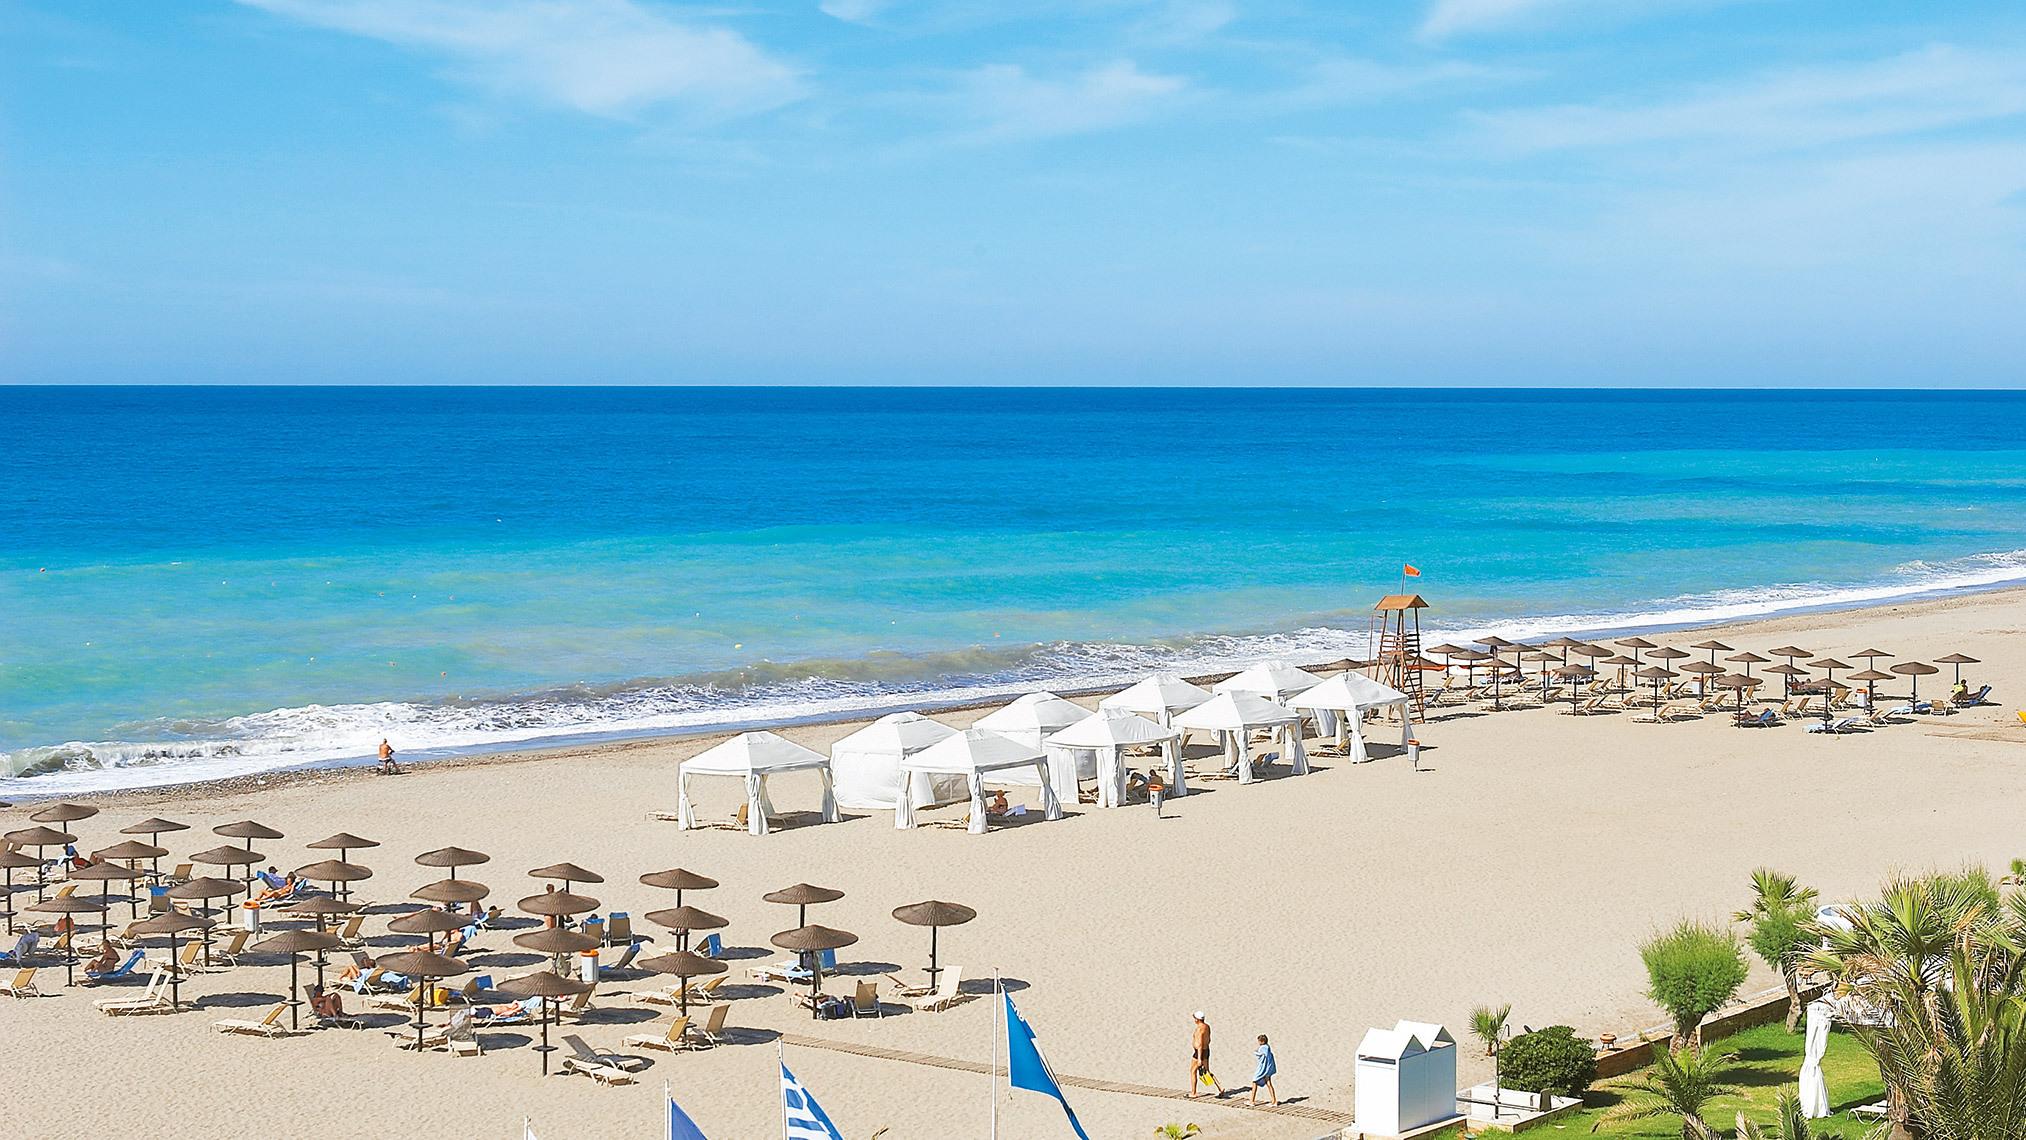 Creta Palace | Luxury Hotel in Crete